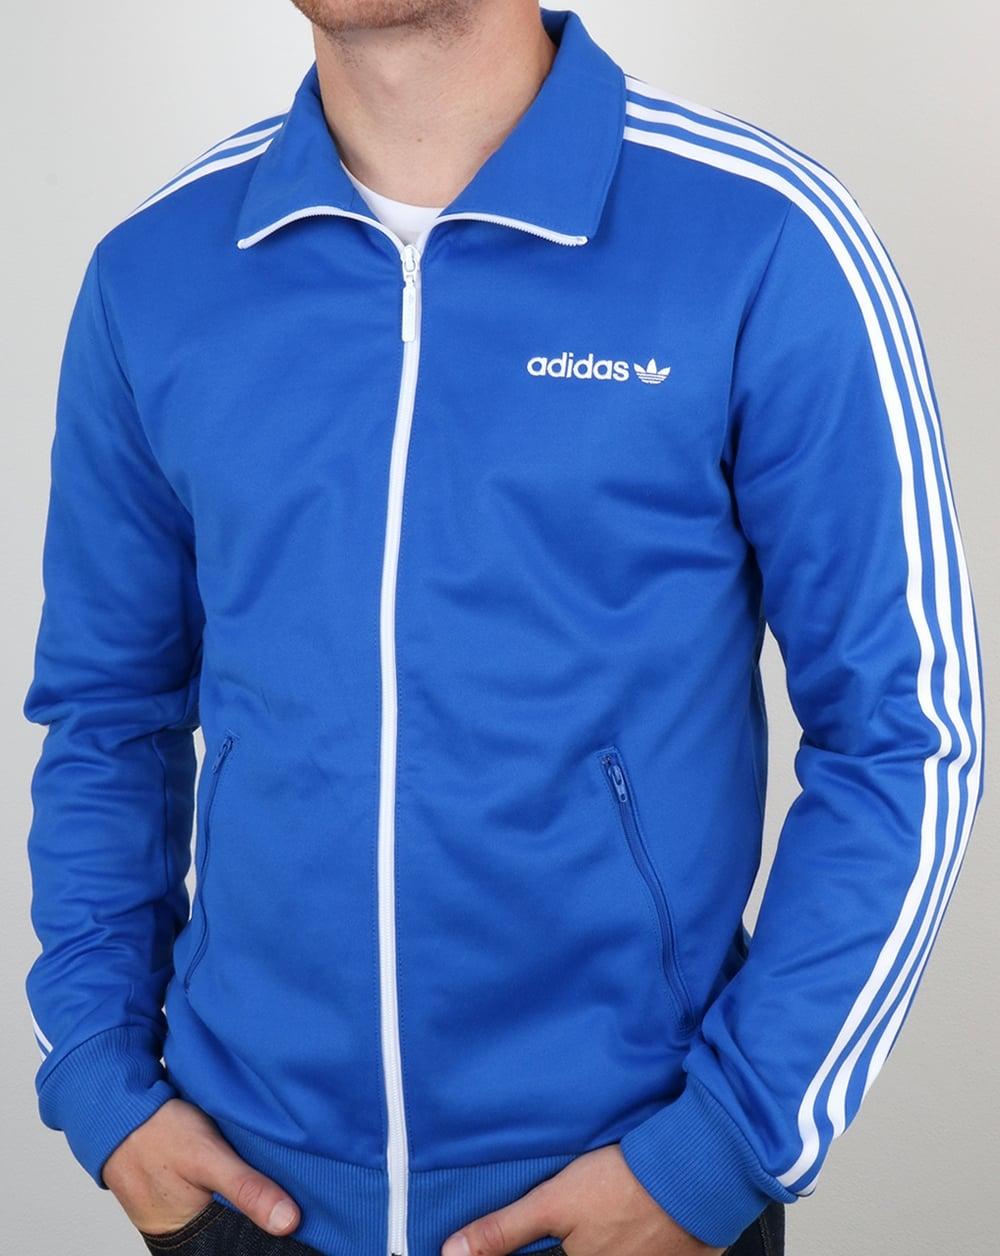 adidas beckenbauer track top blue jacket royal originals bluebird. Black Bedroom Furniture Sets. Home Design Ideas